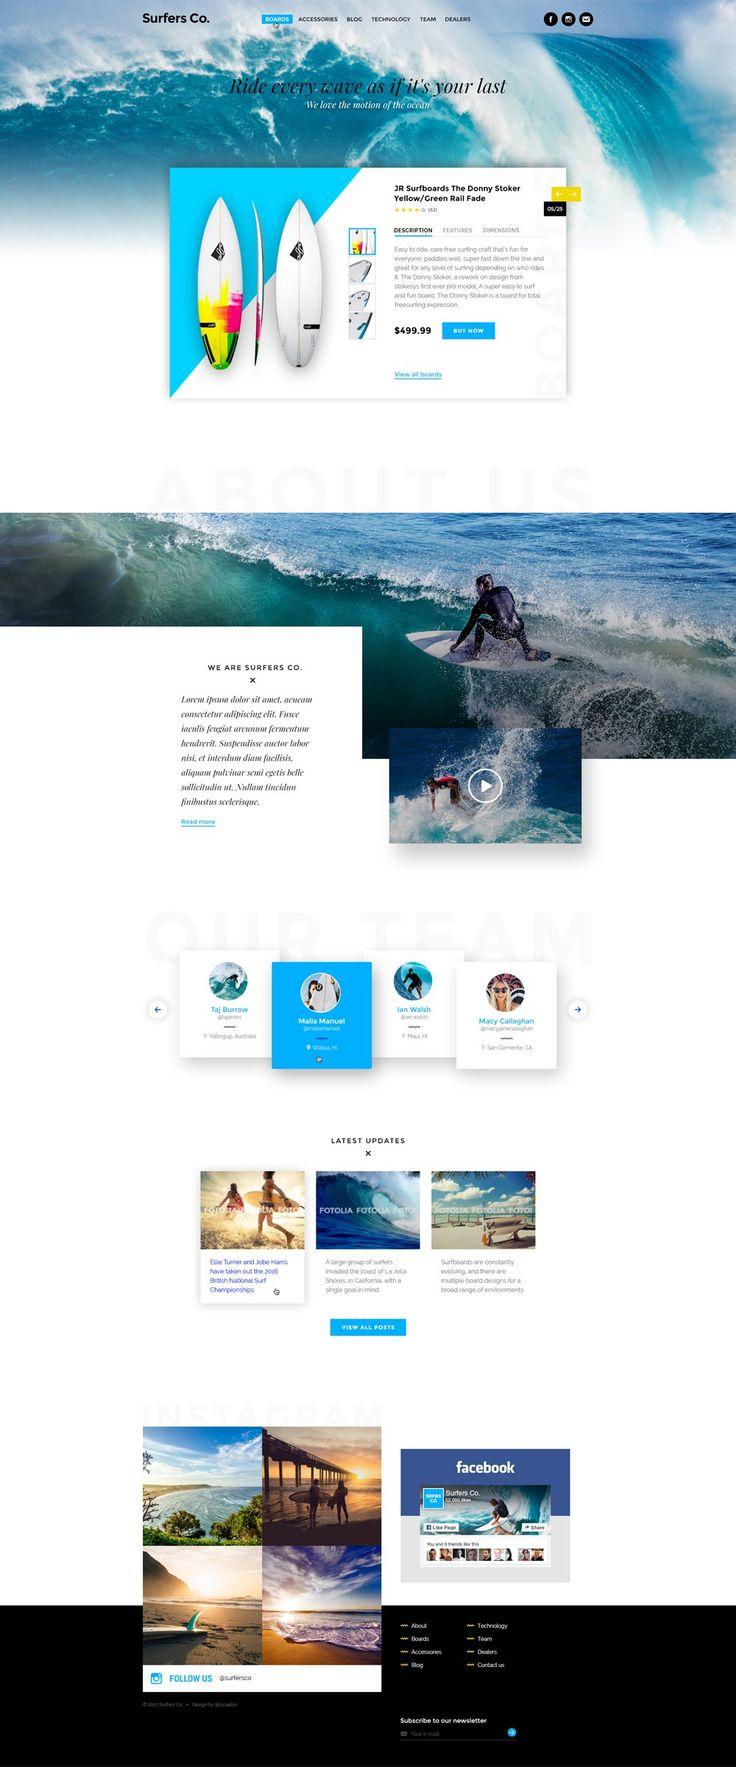 Surfers Co Web Template PSD for Surf Shop